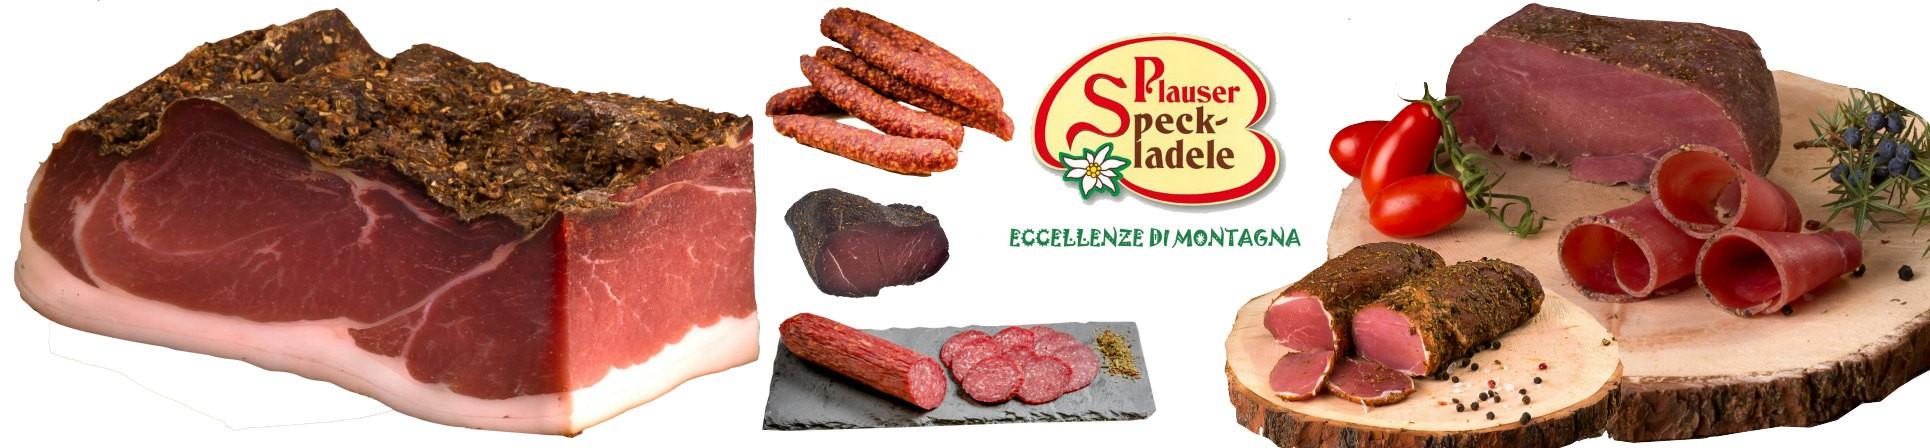 carne salada e speck vendita online alto adige - Plauser Speck Ladele